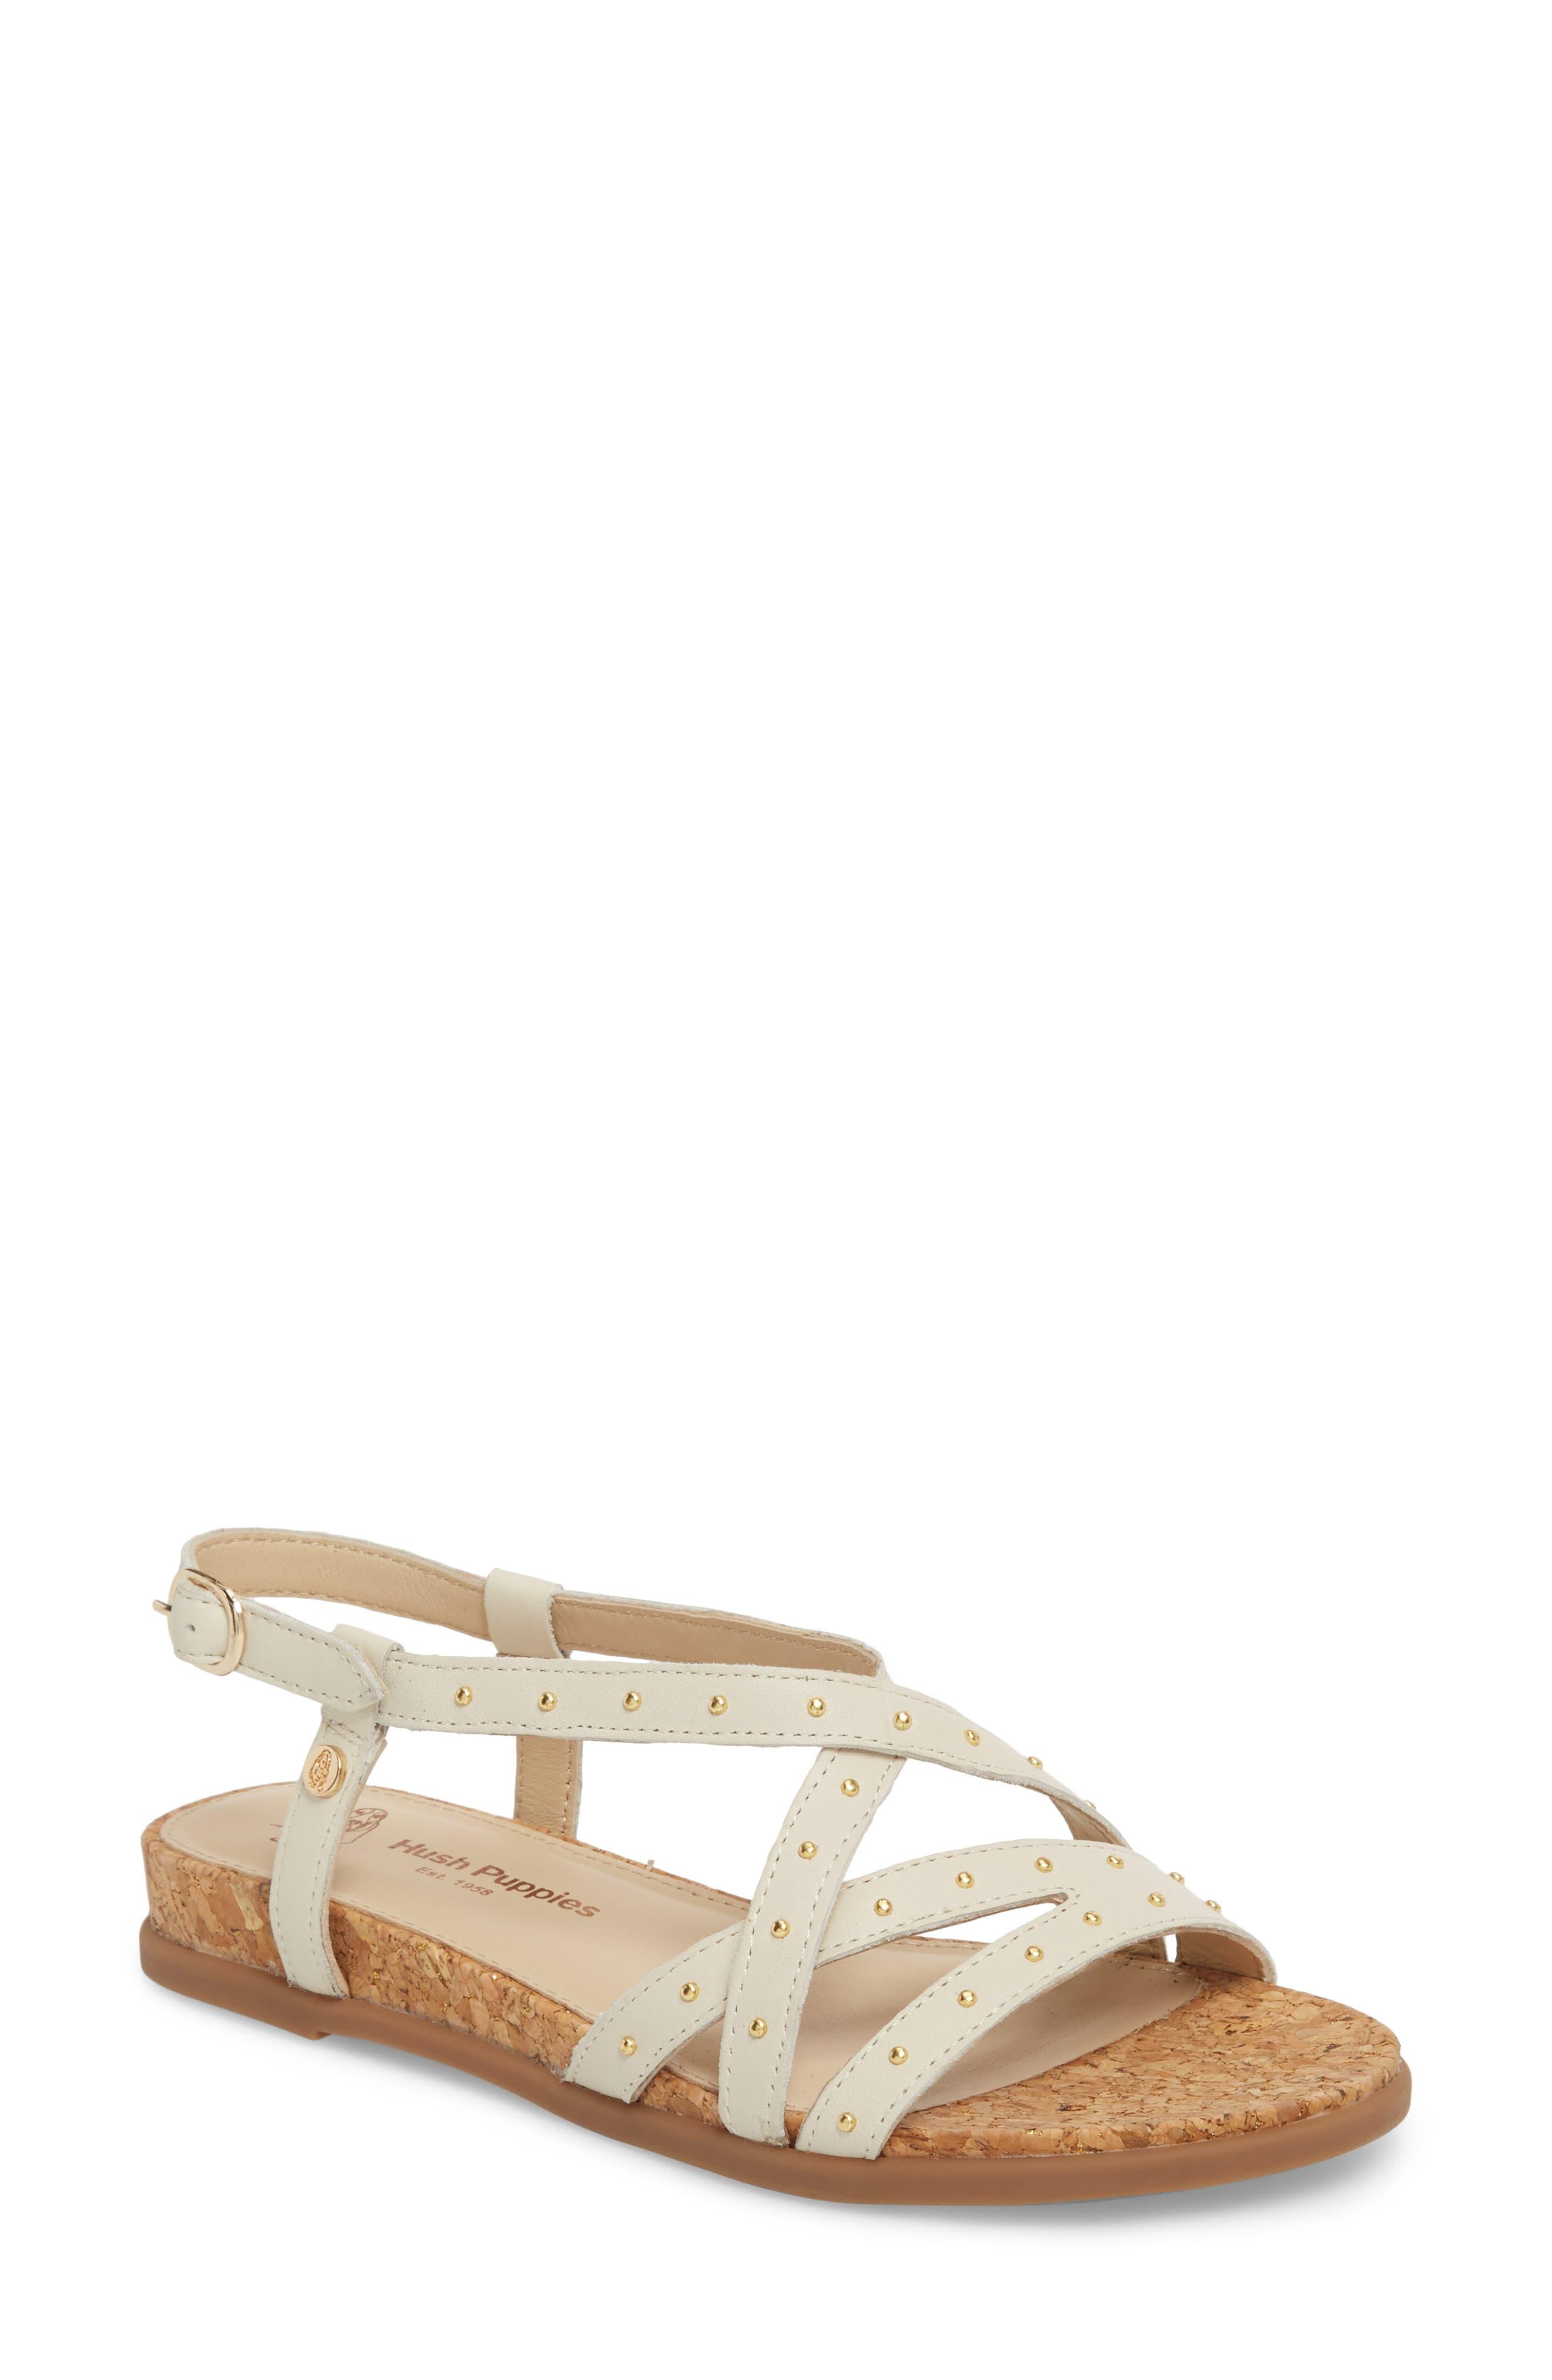 Dalmatian Studded Sandal,                             Main thumbnail 4, color,